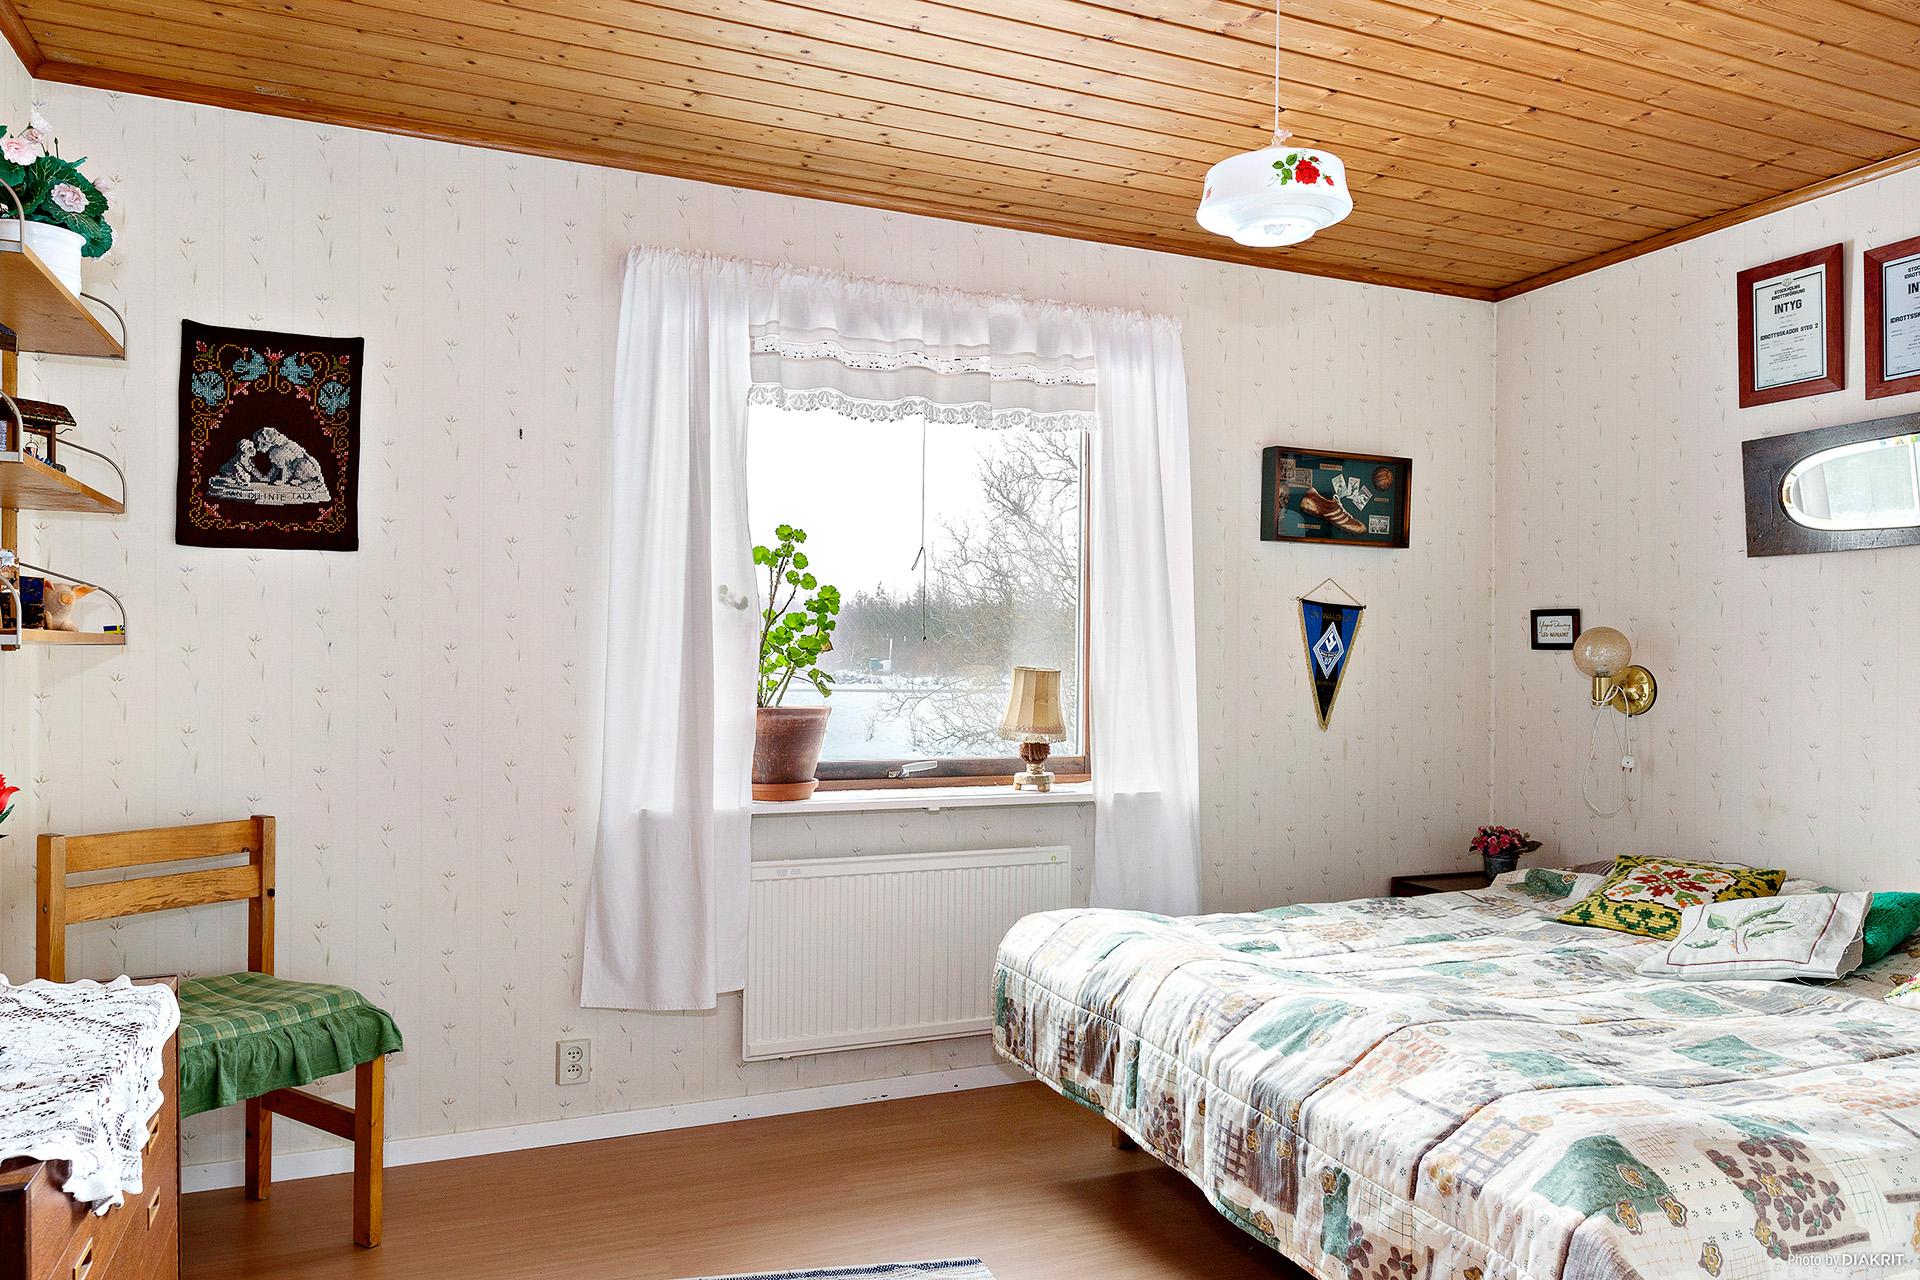 Ett av sovrummen med fönster mot husets framsida.